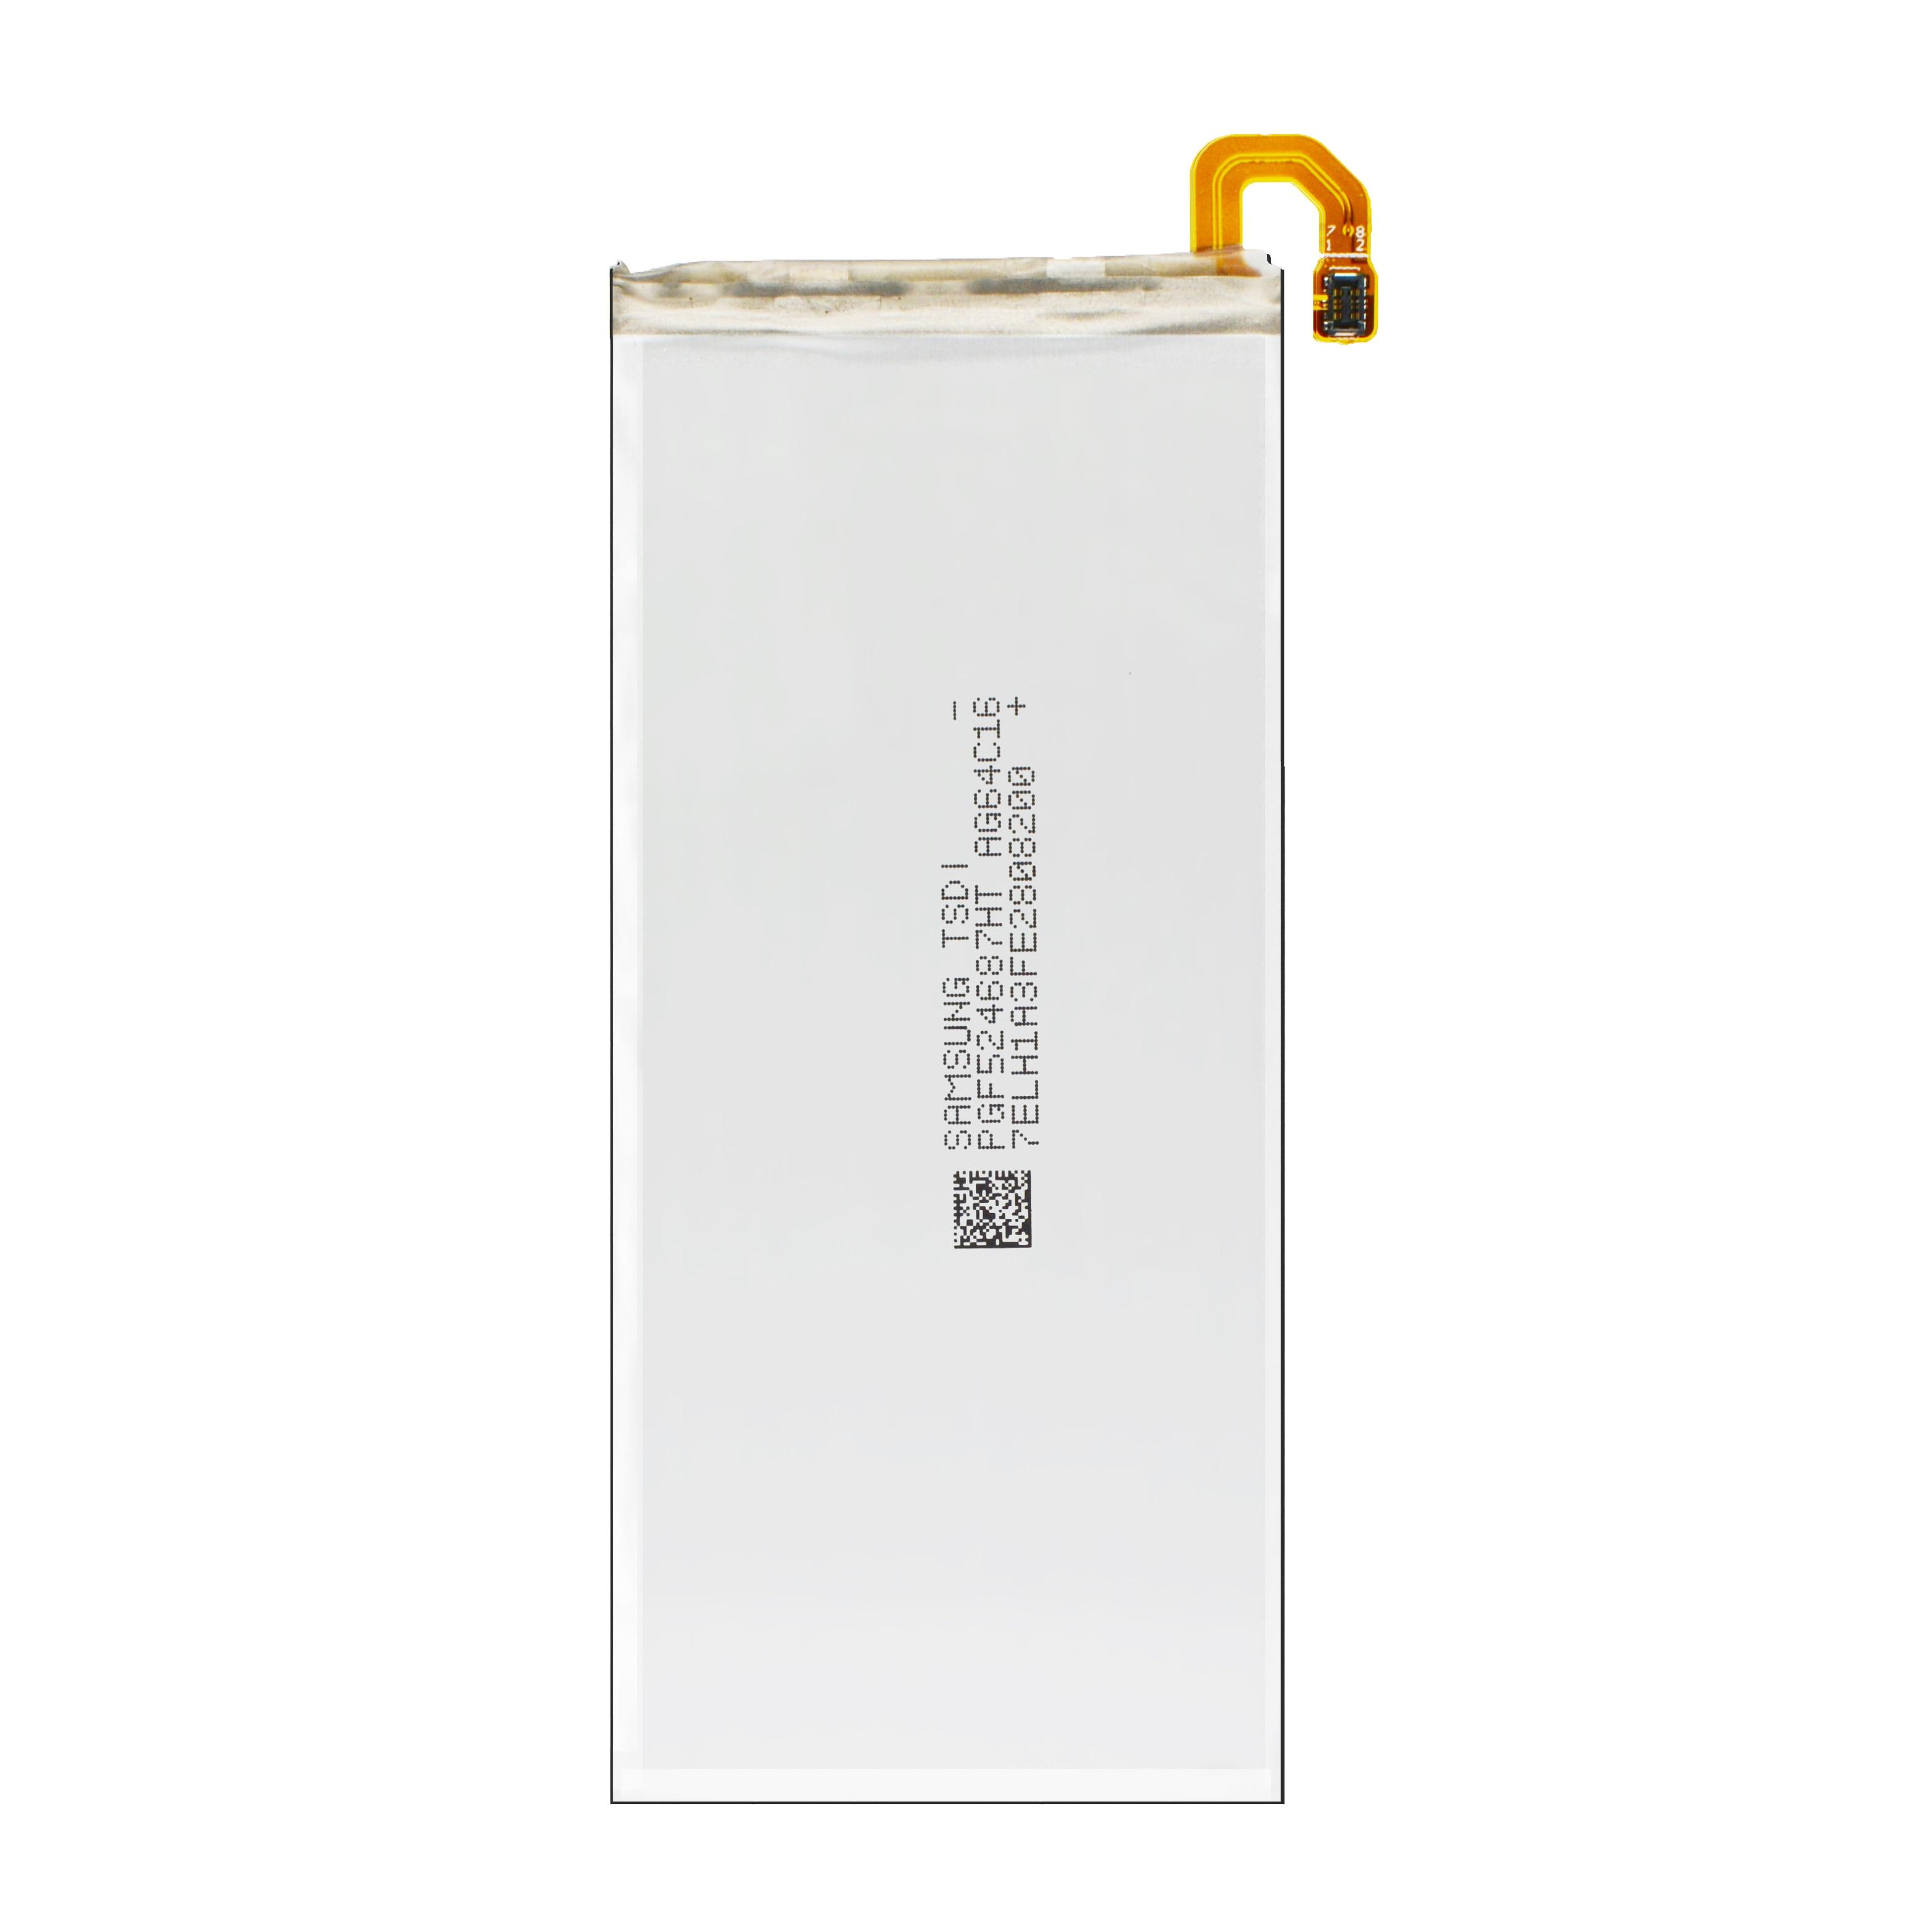 20pcs/lot High Quality Battery EB-BG885ABU For Samsung Galaxy A8 /A9 Star SM-G885F G8850 G885Y Phone Replacement Bateria 3700mAh enlarge